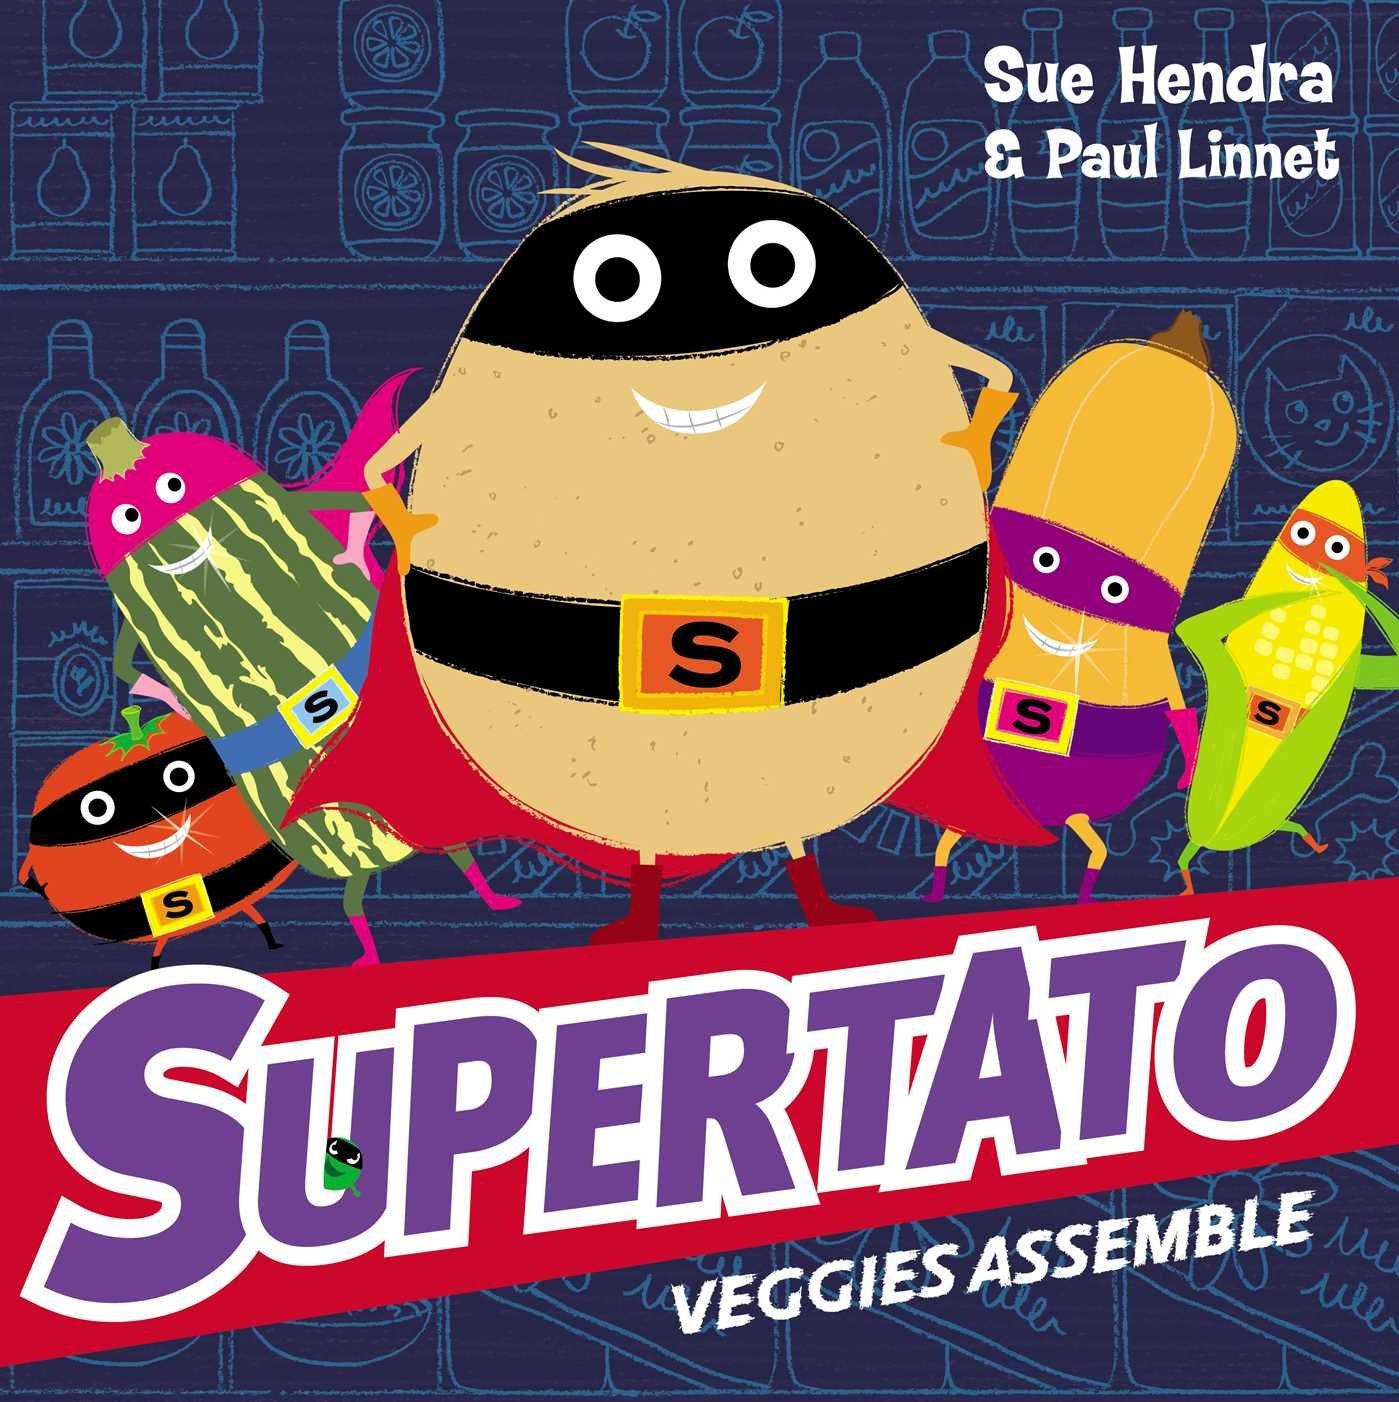 Supertato Veggies Assemble: Amazon.co.uk: Hendra, Sue, Linnet, Paul: Books